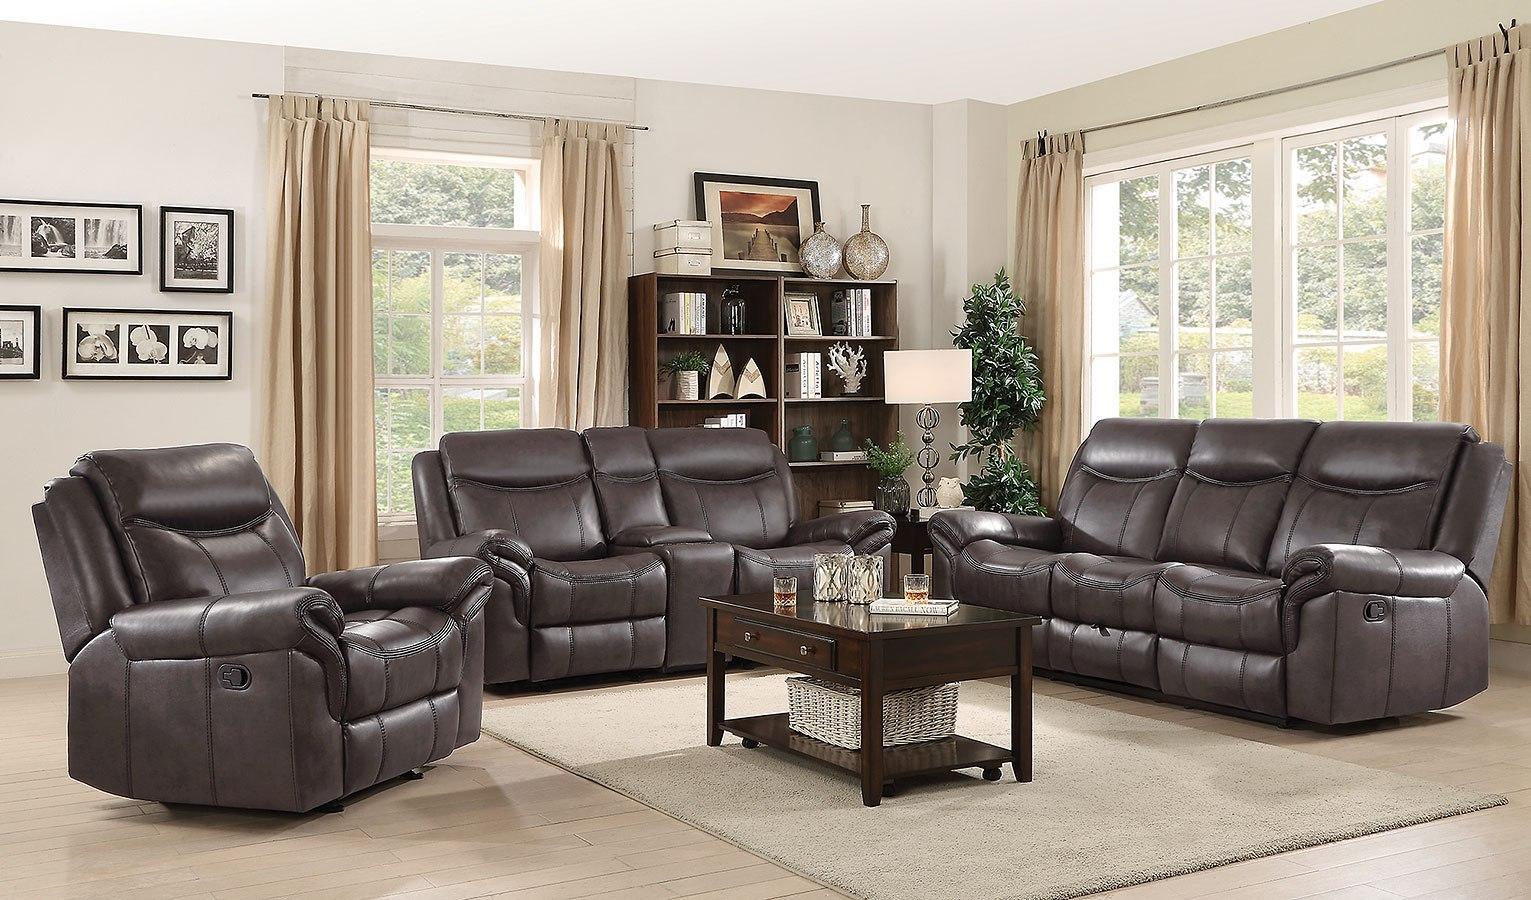 Sawyer reclining living room set brown